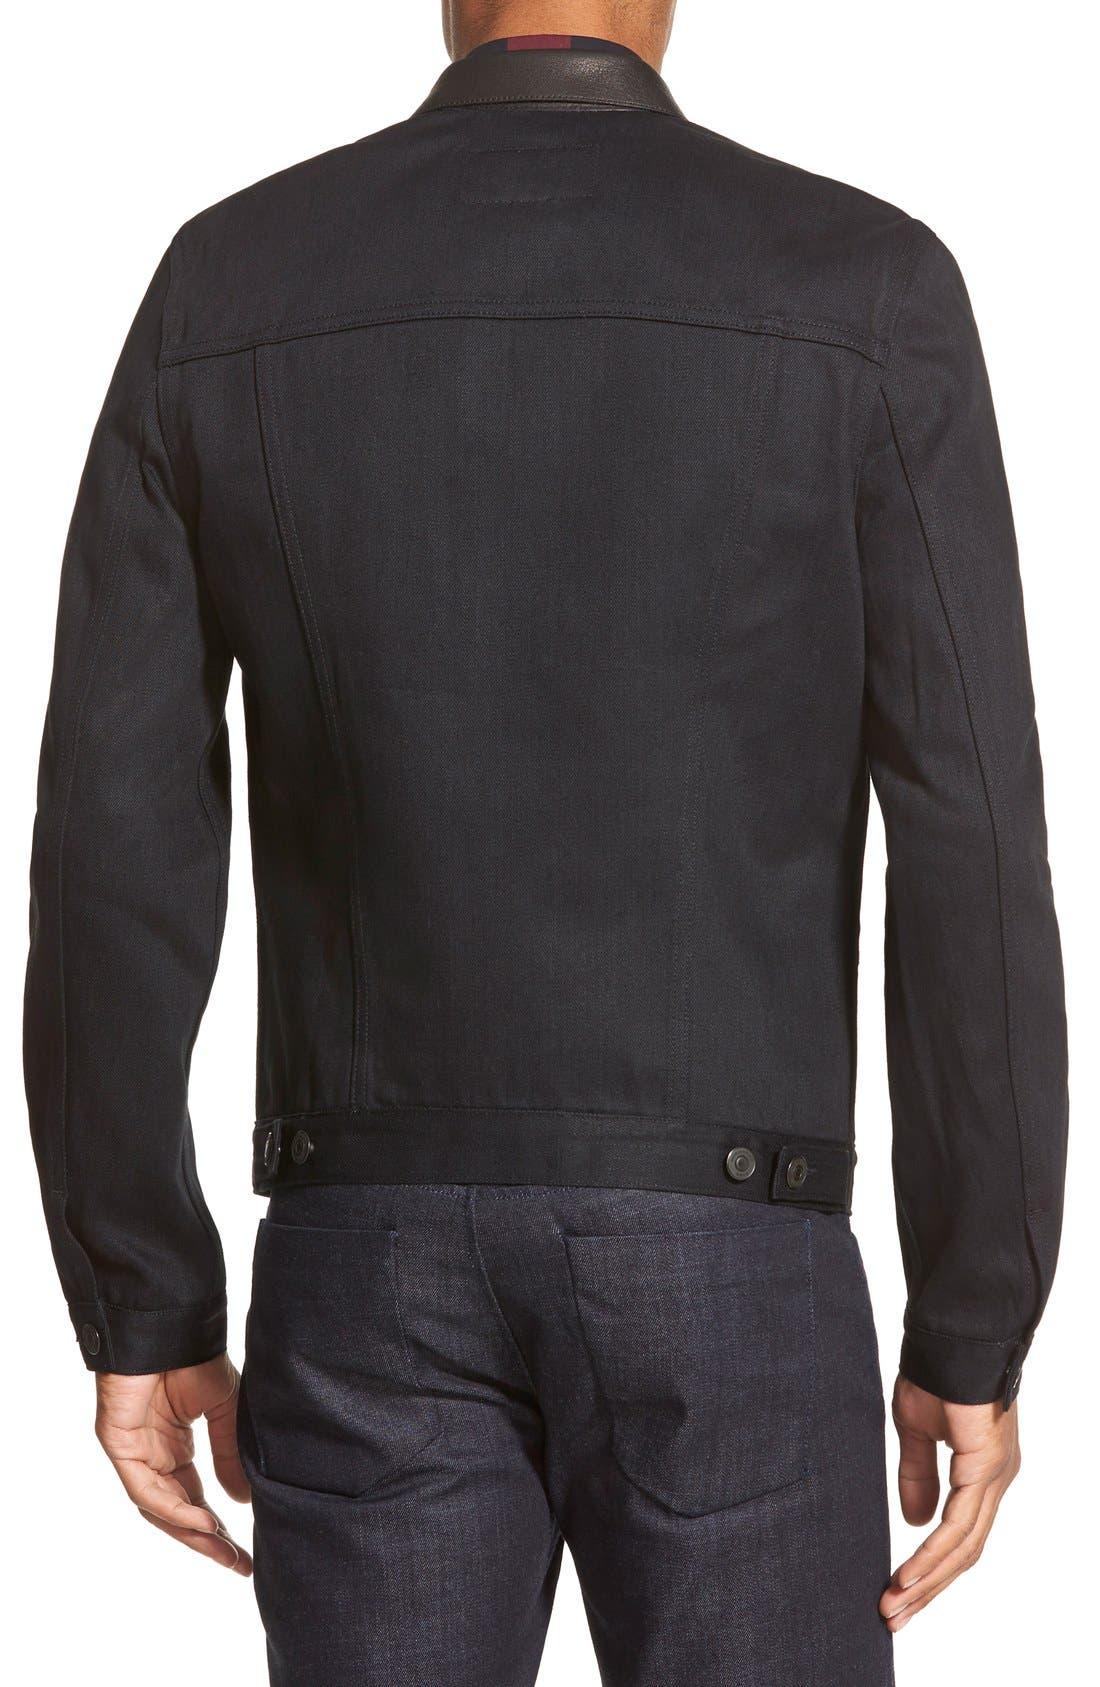 BURBERRY, Brit 'Skipper' Trim Fit Denim Jacket with Leather Collar, Alternate thumbnail 4, color, 001